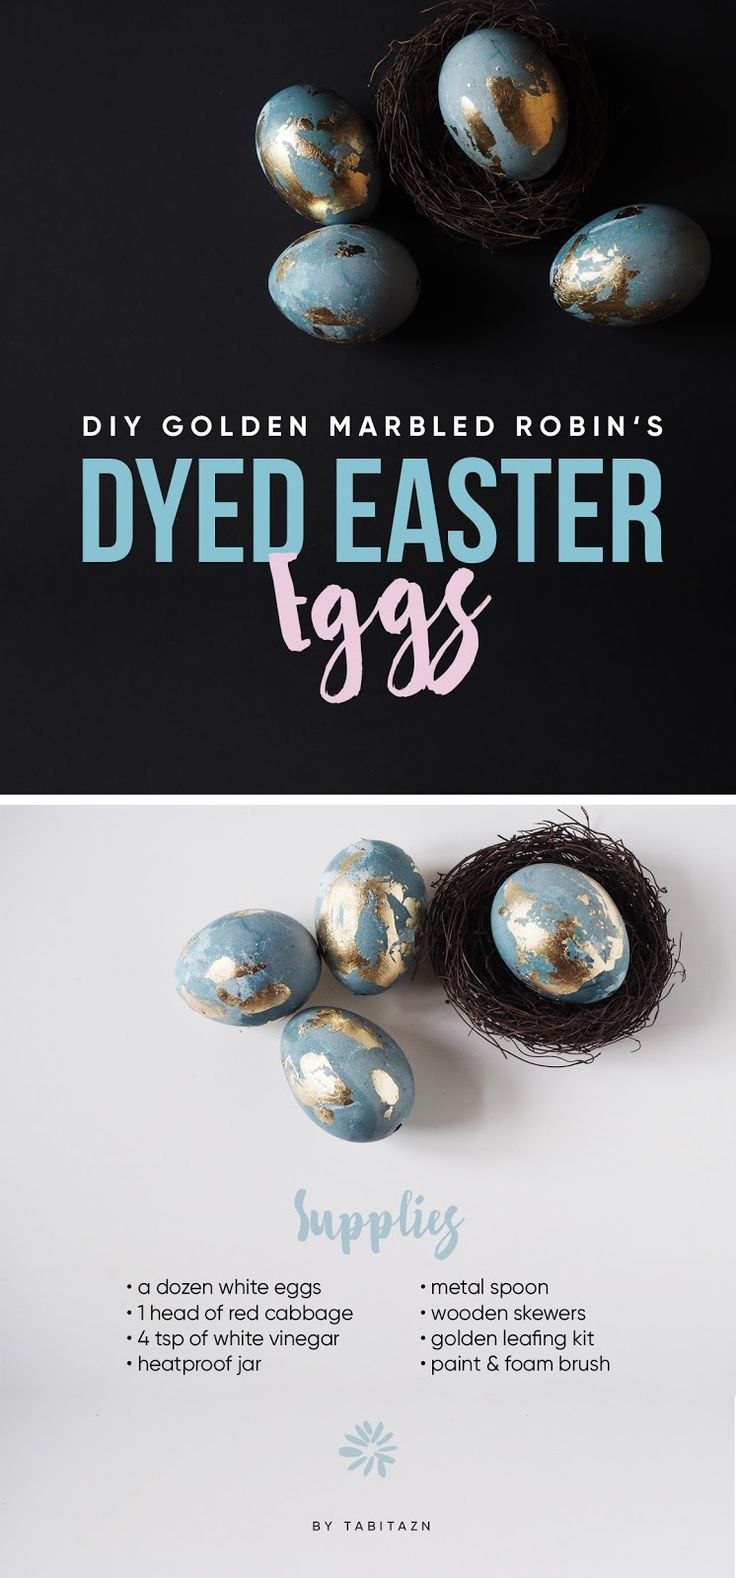 DIY trendy golden marbled robin's dyed Easter eggs